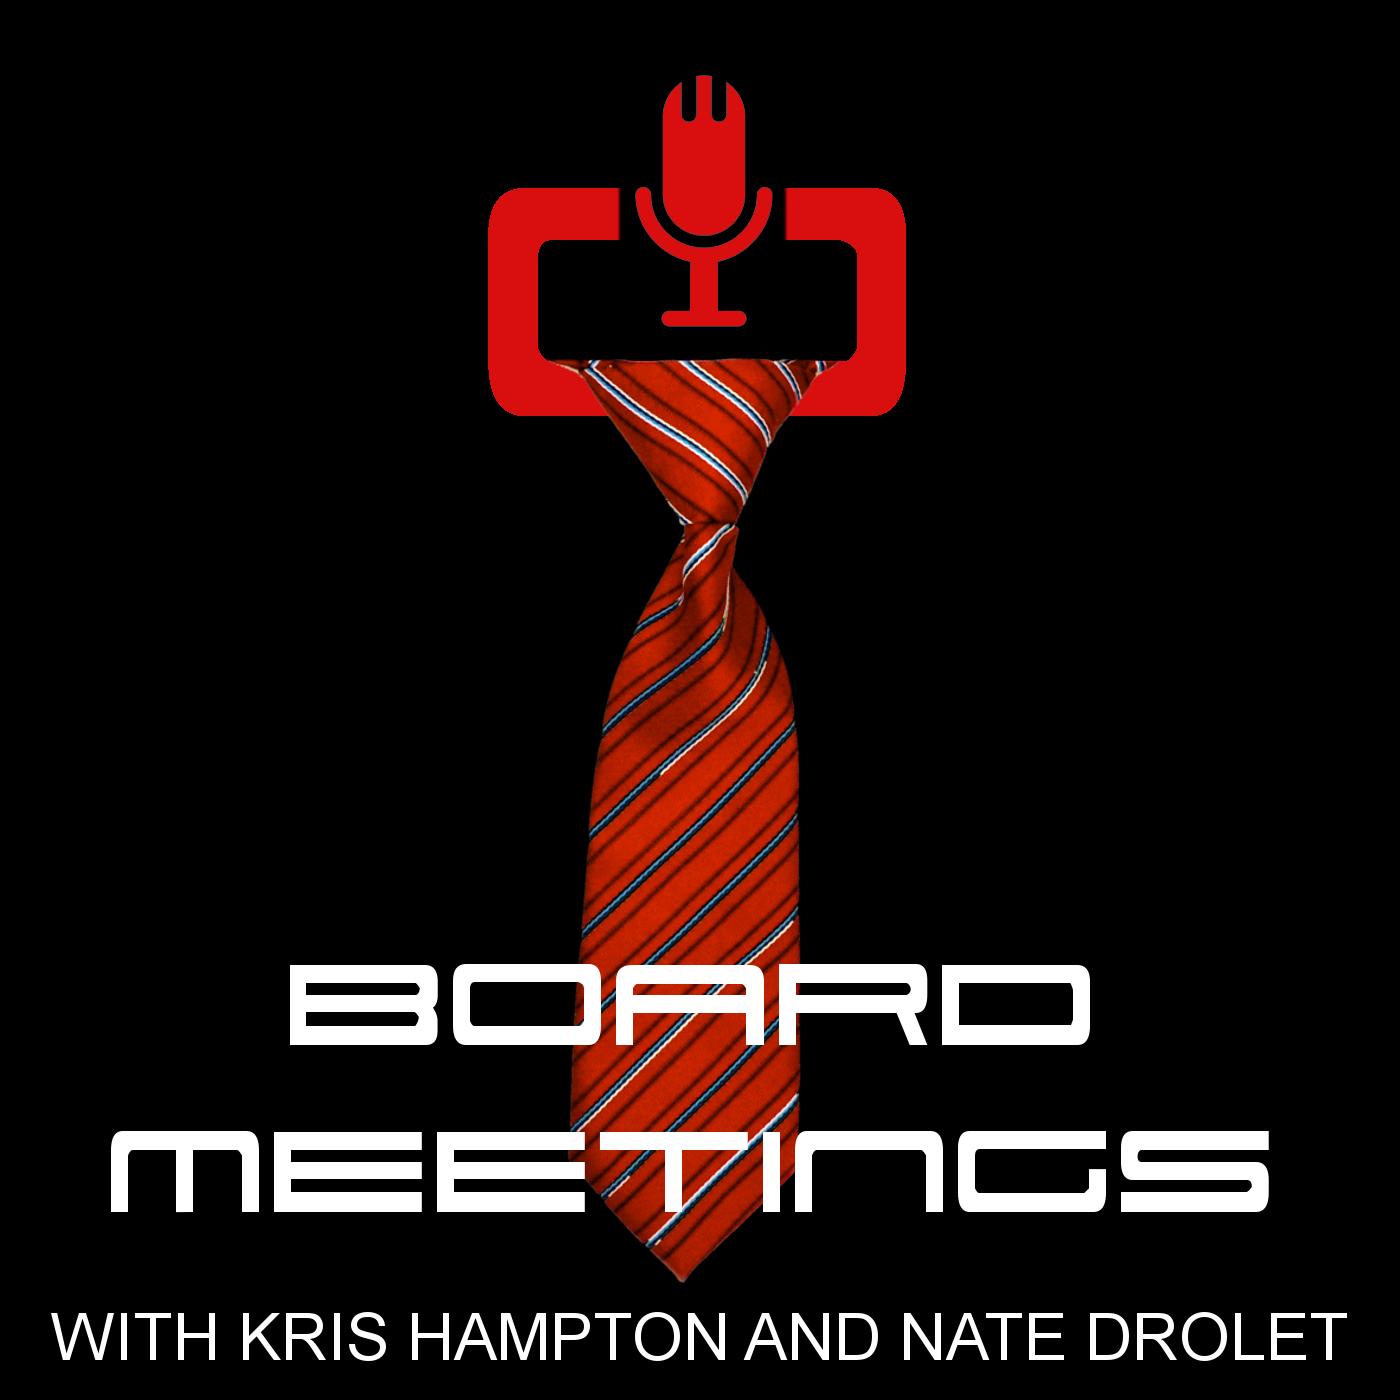 power company board meetings